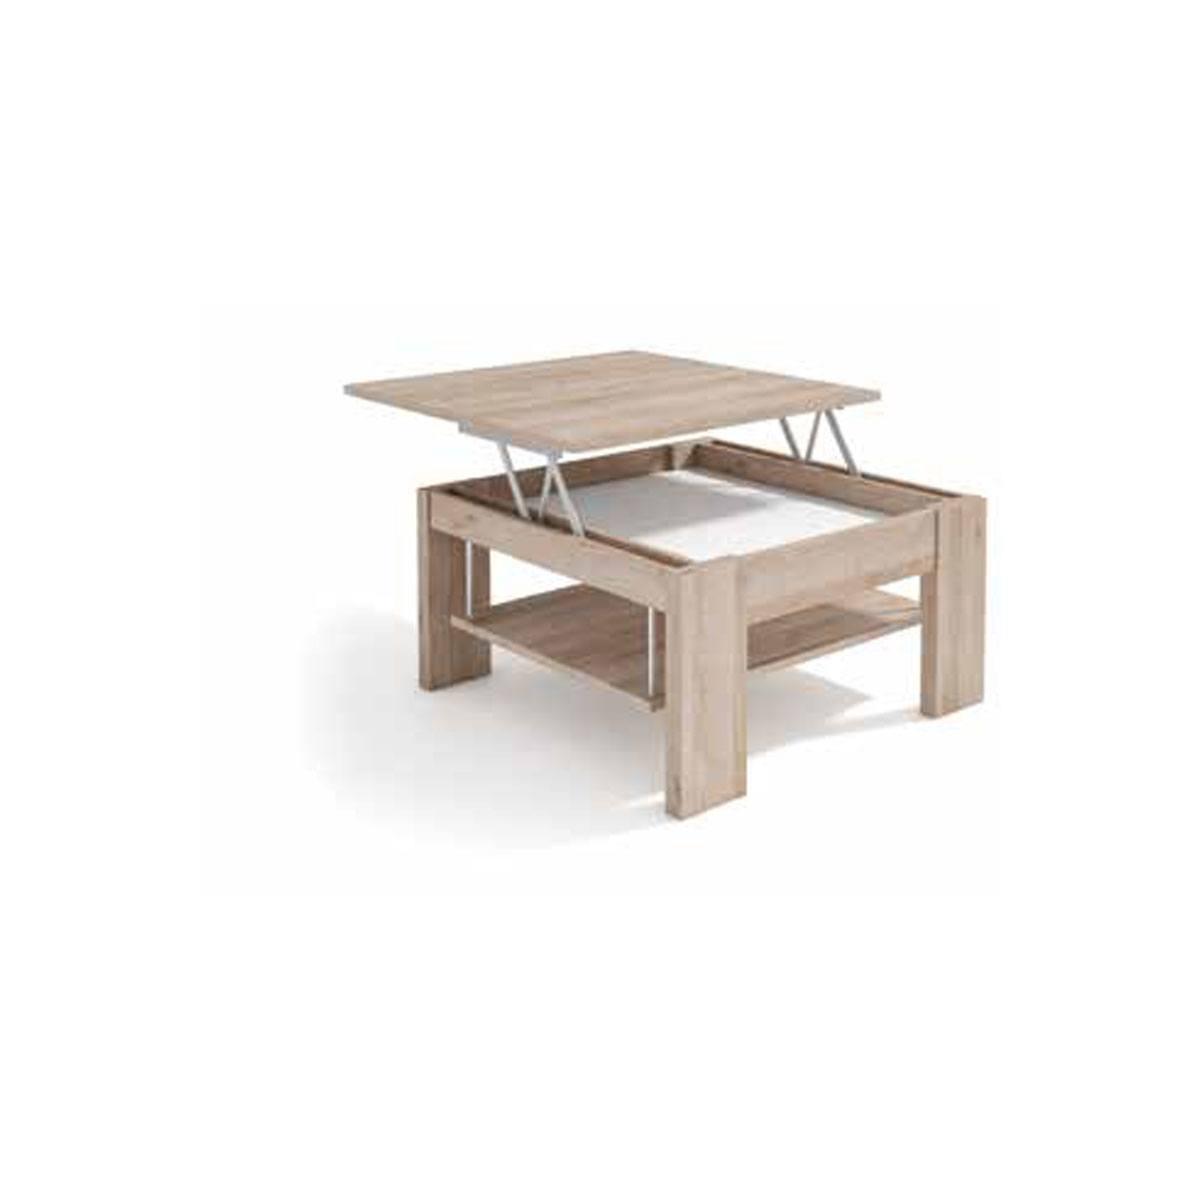 Comprar Mesa Centro Elevable Comedor.Mesa De Centro Elevable Cuadrada 80cm Comprar Mesas Elevables